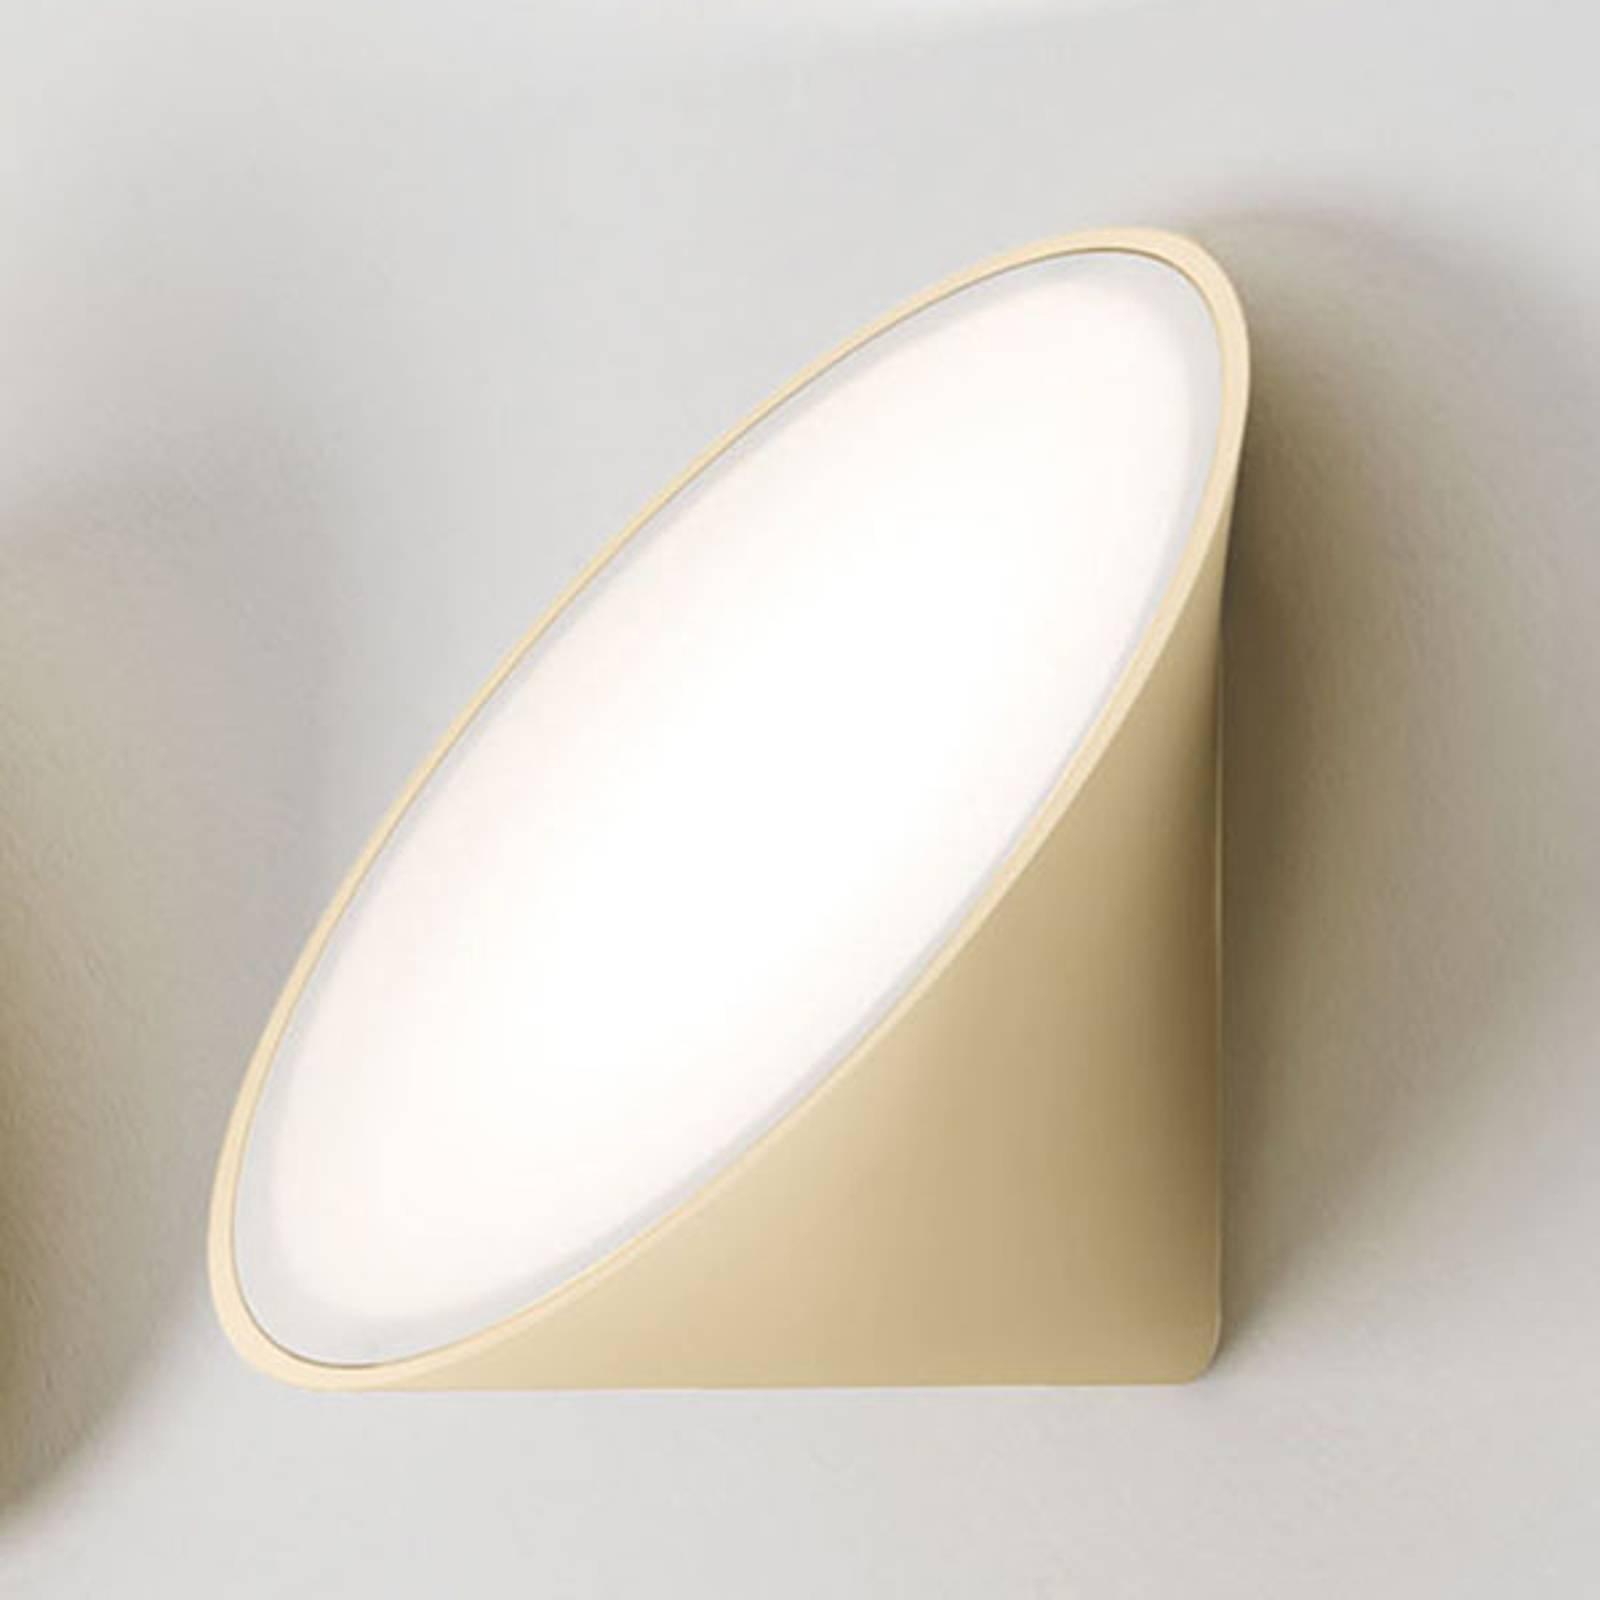 Axolight Orchid LED-Wandleuchte, sand